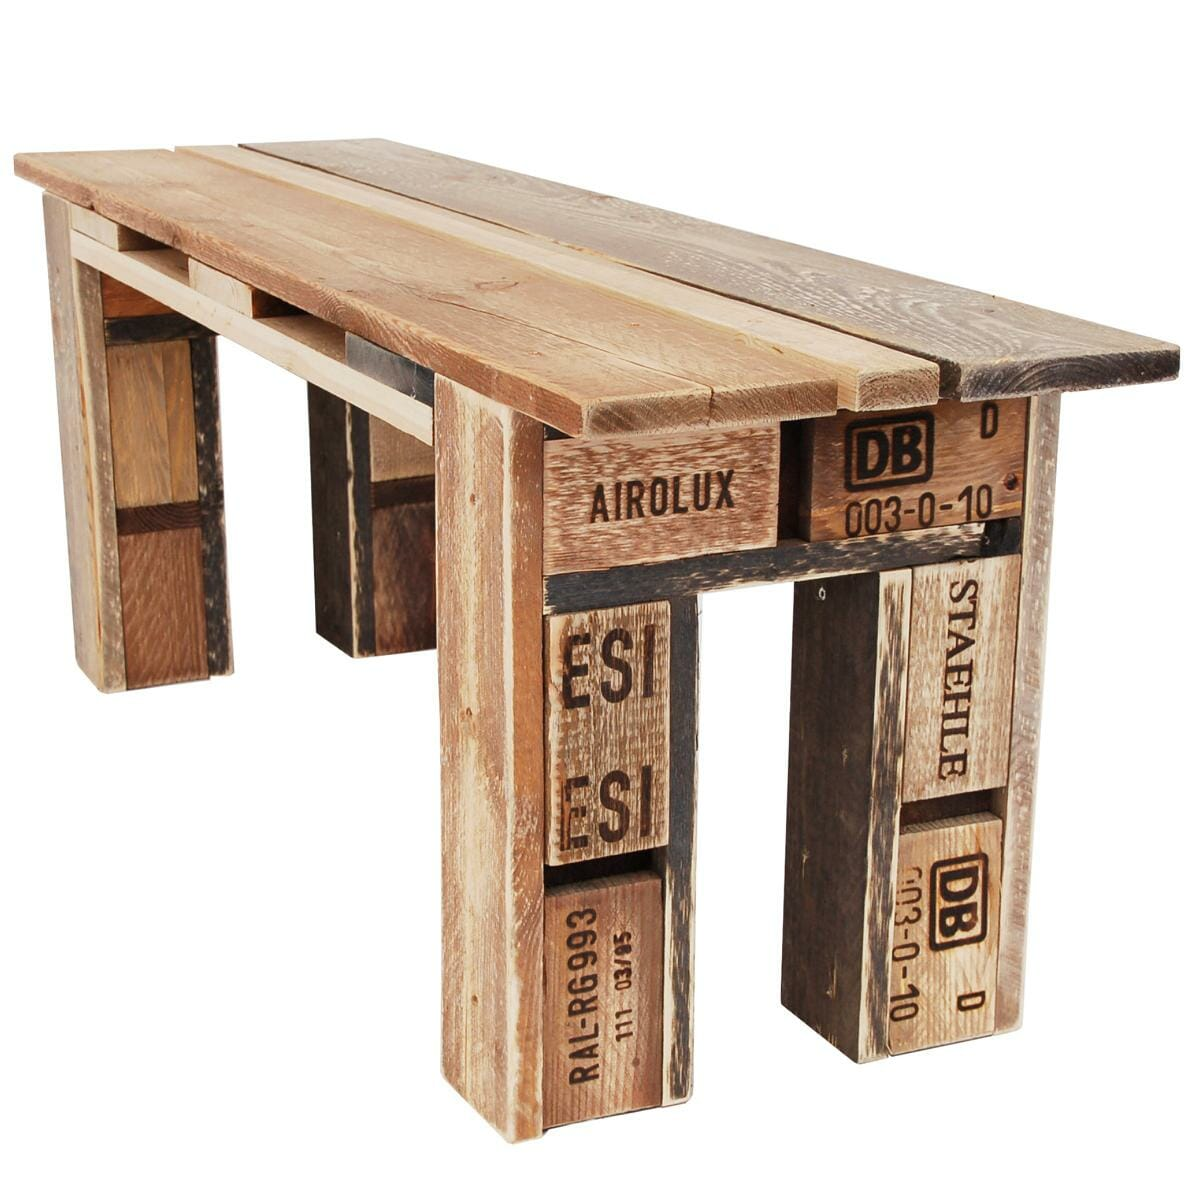 ᐅ Gartenmöbel aus Paletten - Europaletten Möbel - Palettenmöbel Shop